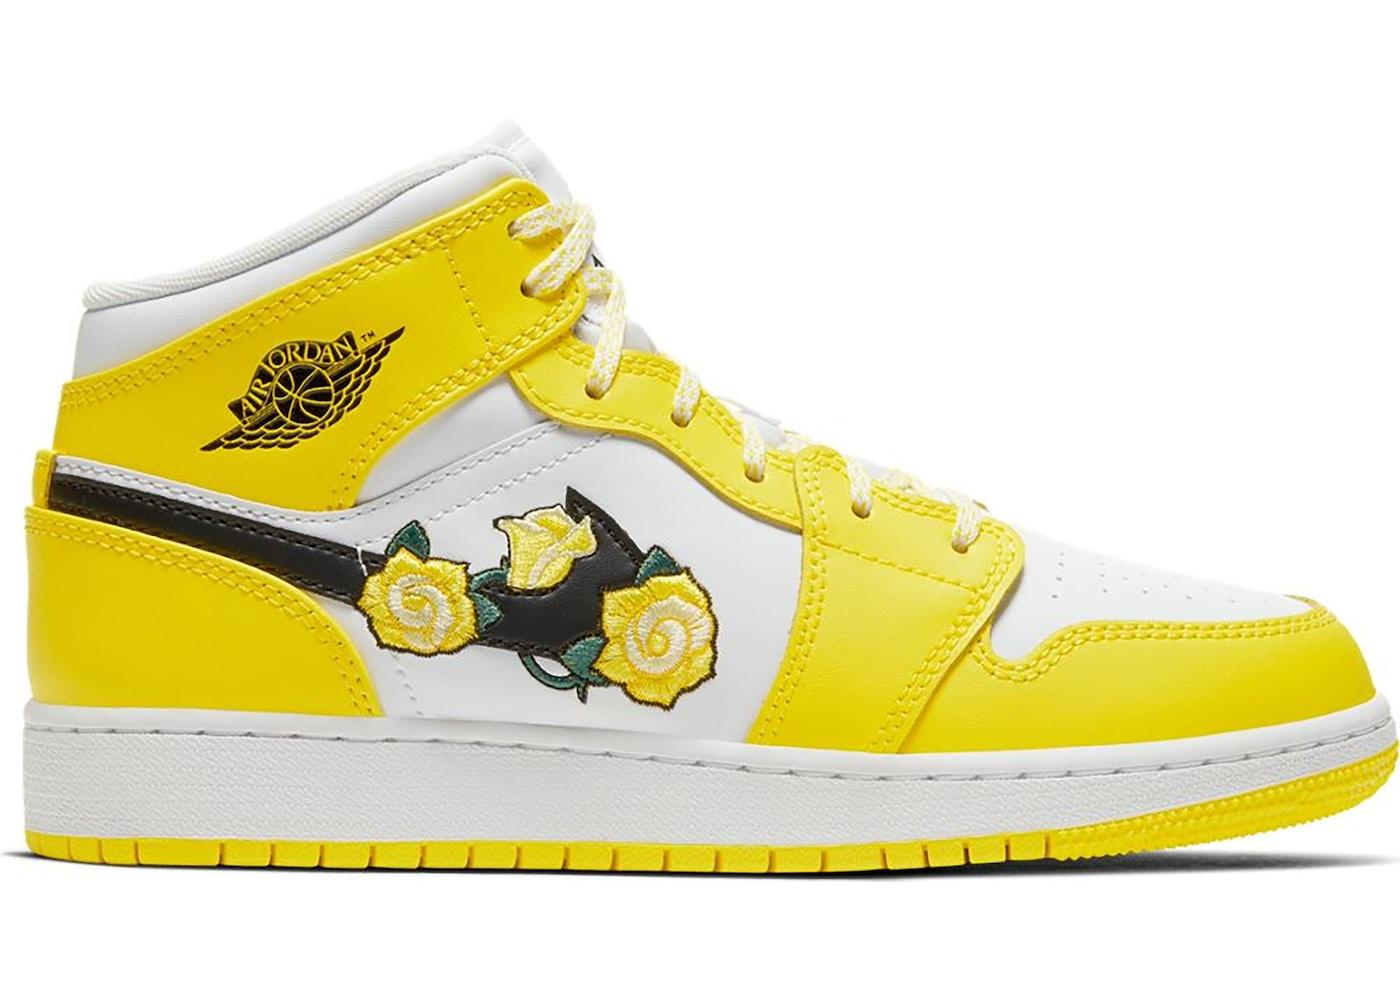 Jordan 1 Mid Dynamic Yellow Floral (GS)